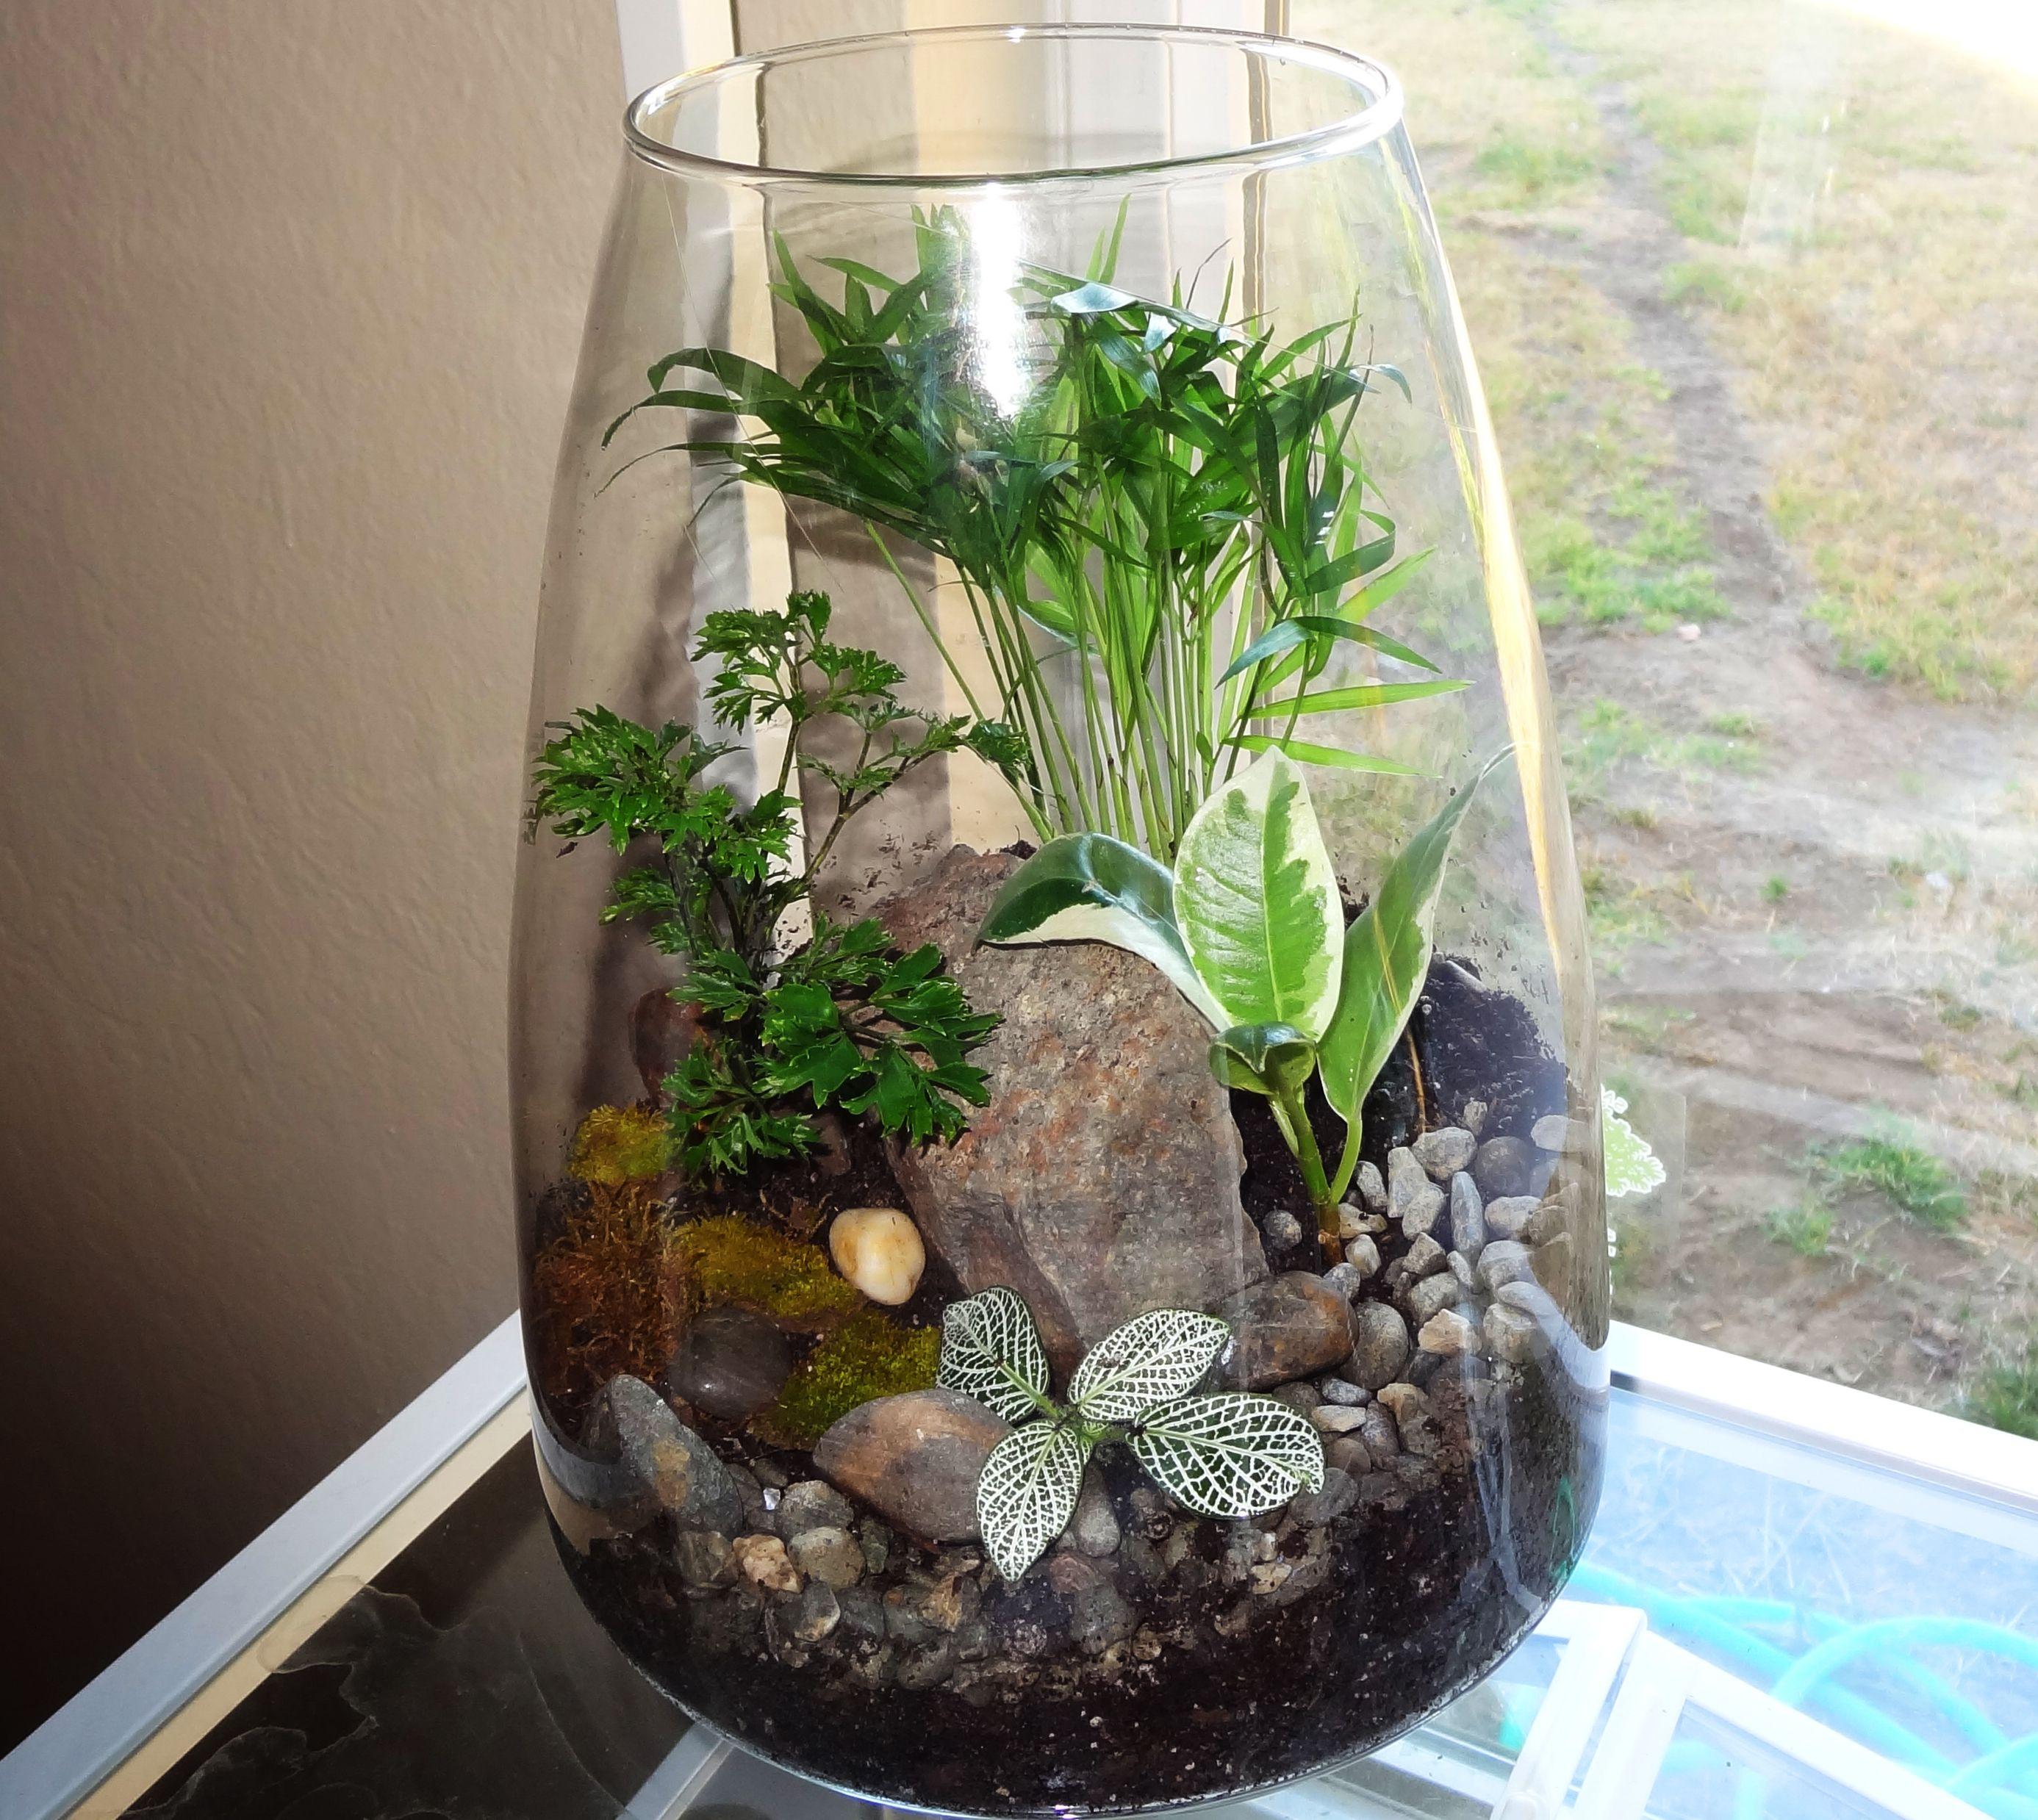 Terrarium with neanthe bella palm, ficus, and aralia parsley.